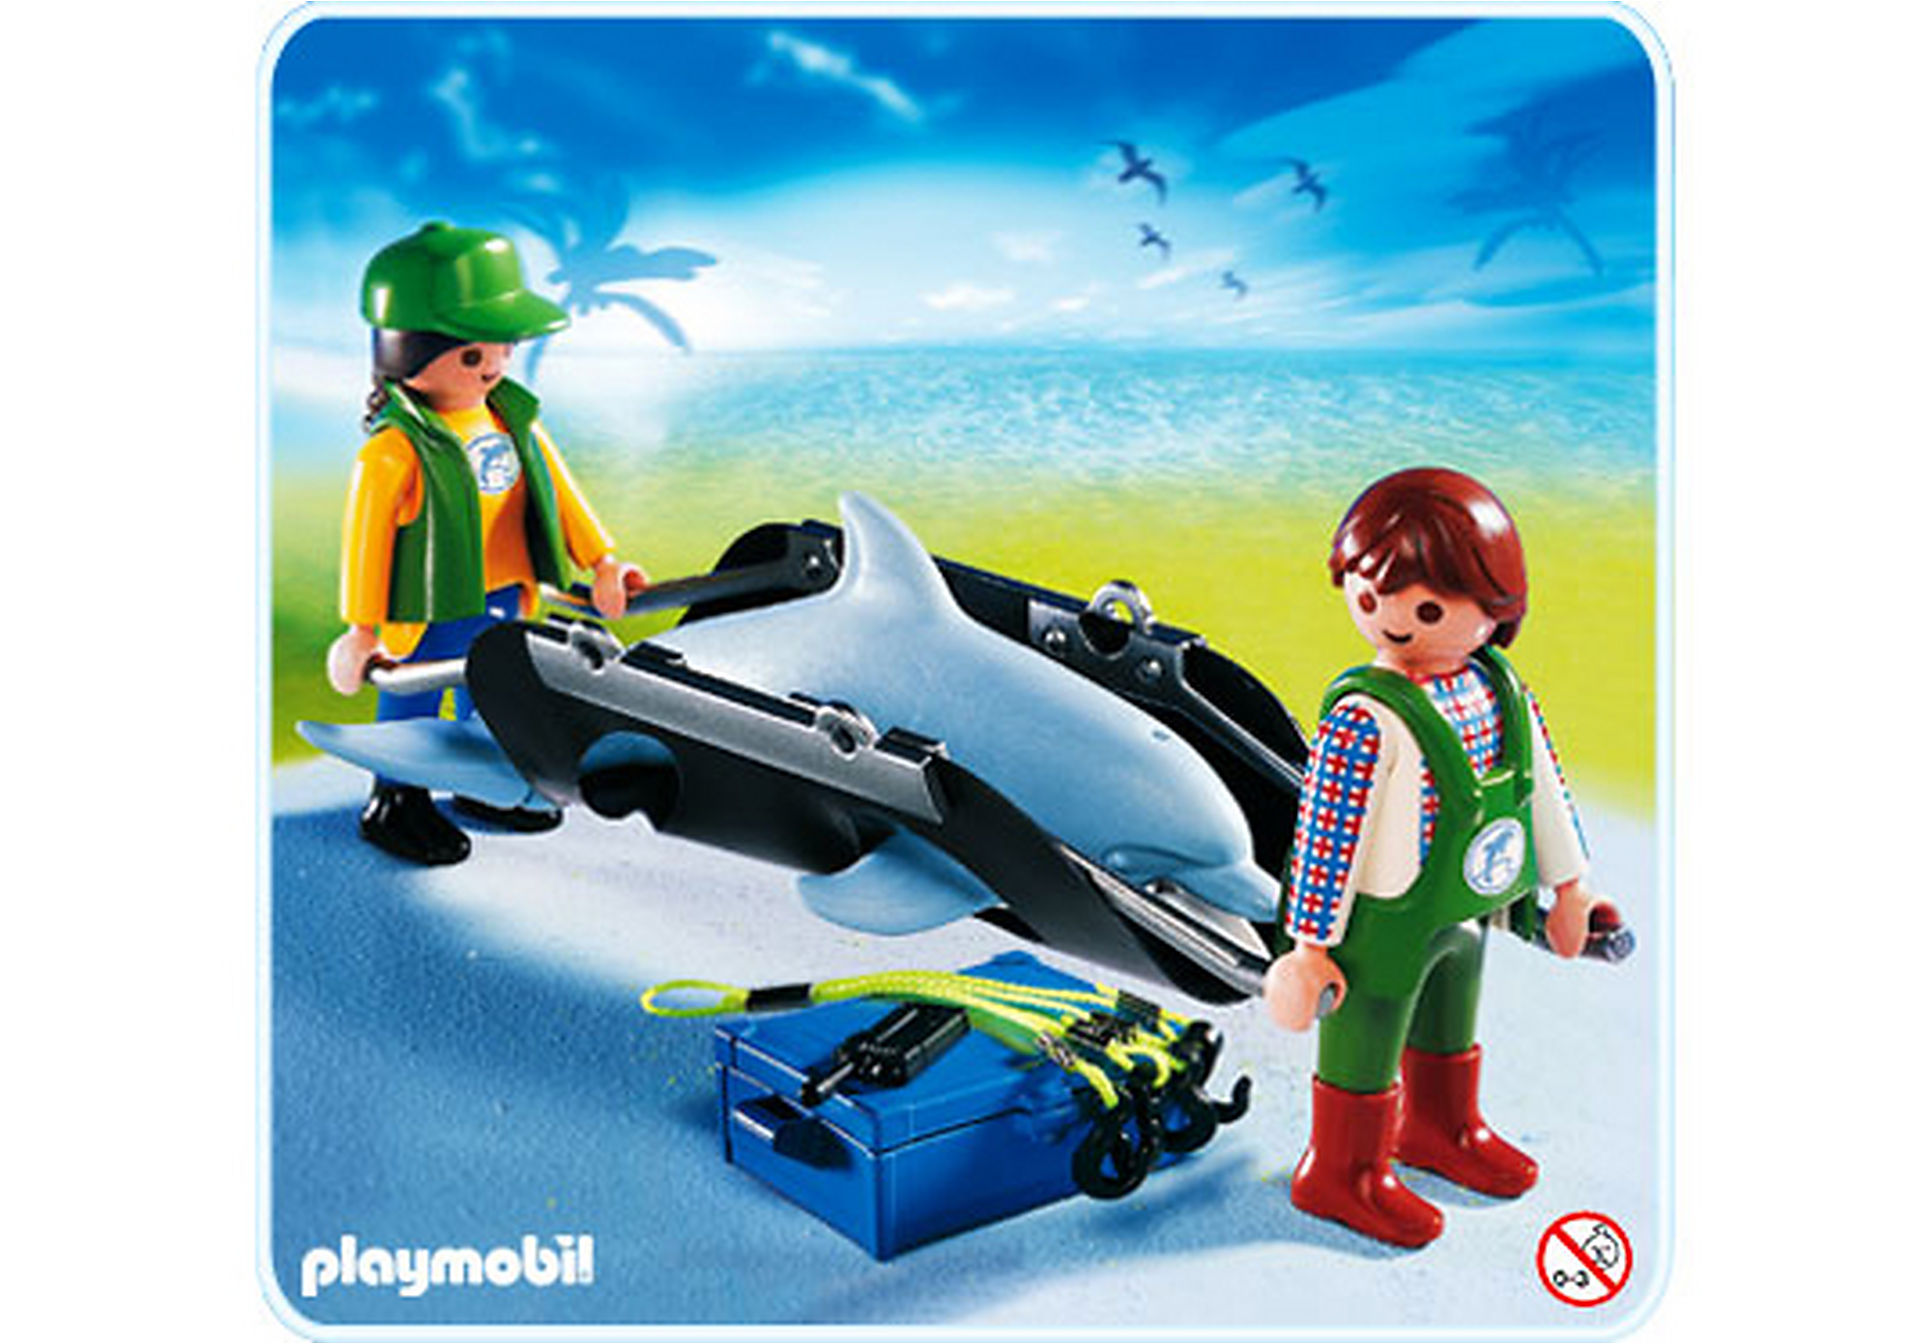 http://media.playmobil.com/i/playmobil/4466-A_product_detail/Tierpfleger mit Delfin